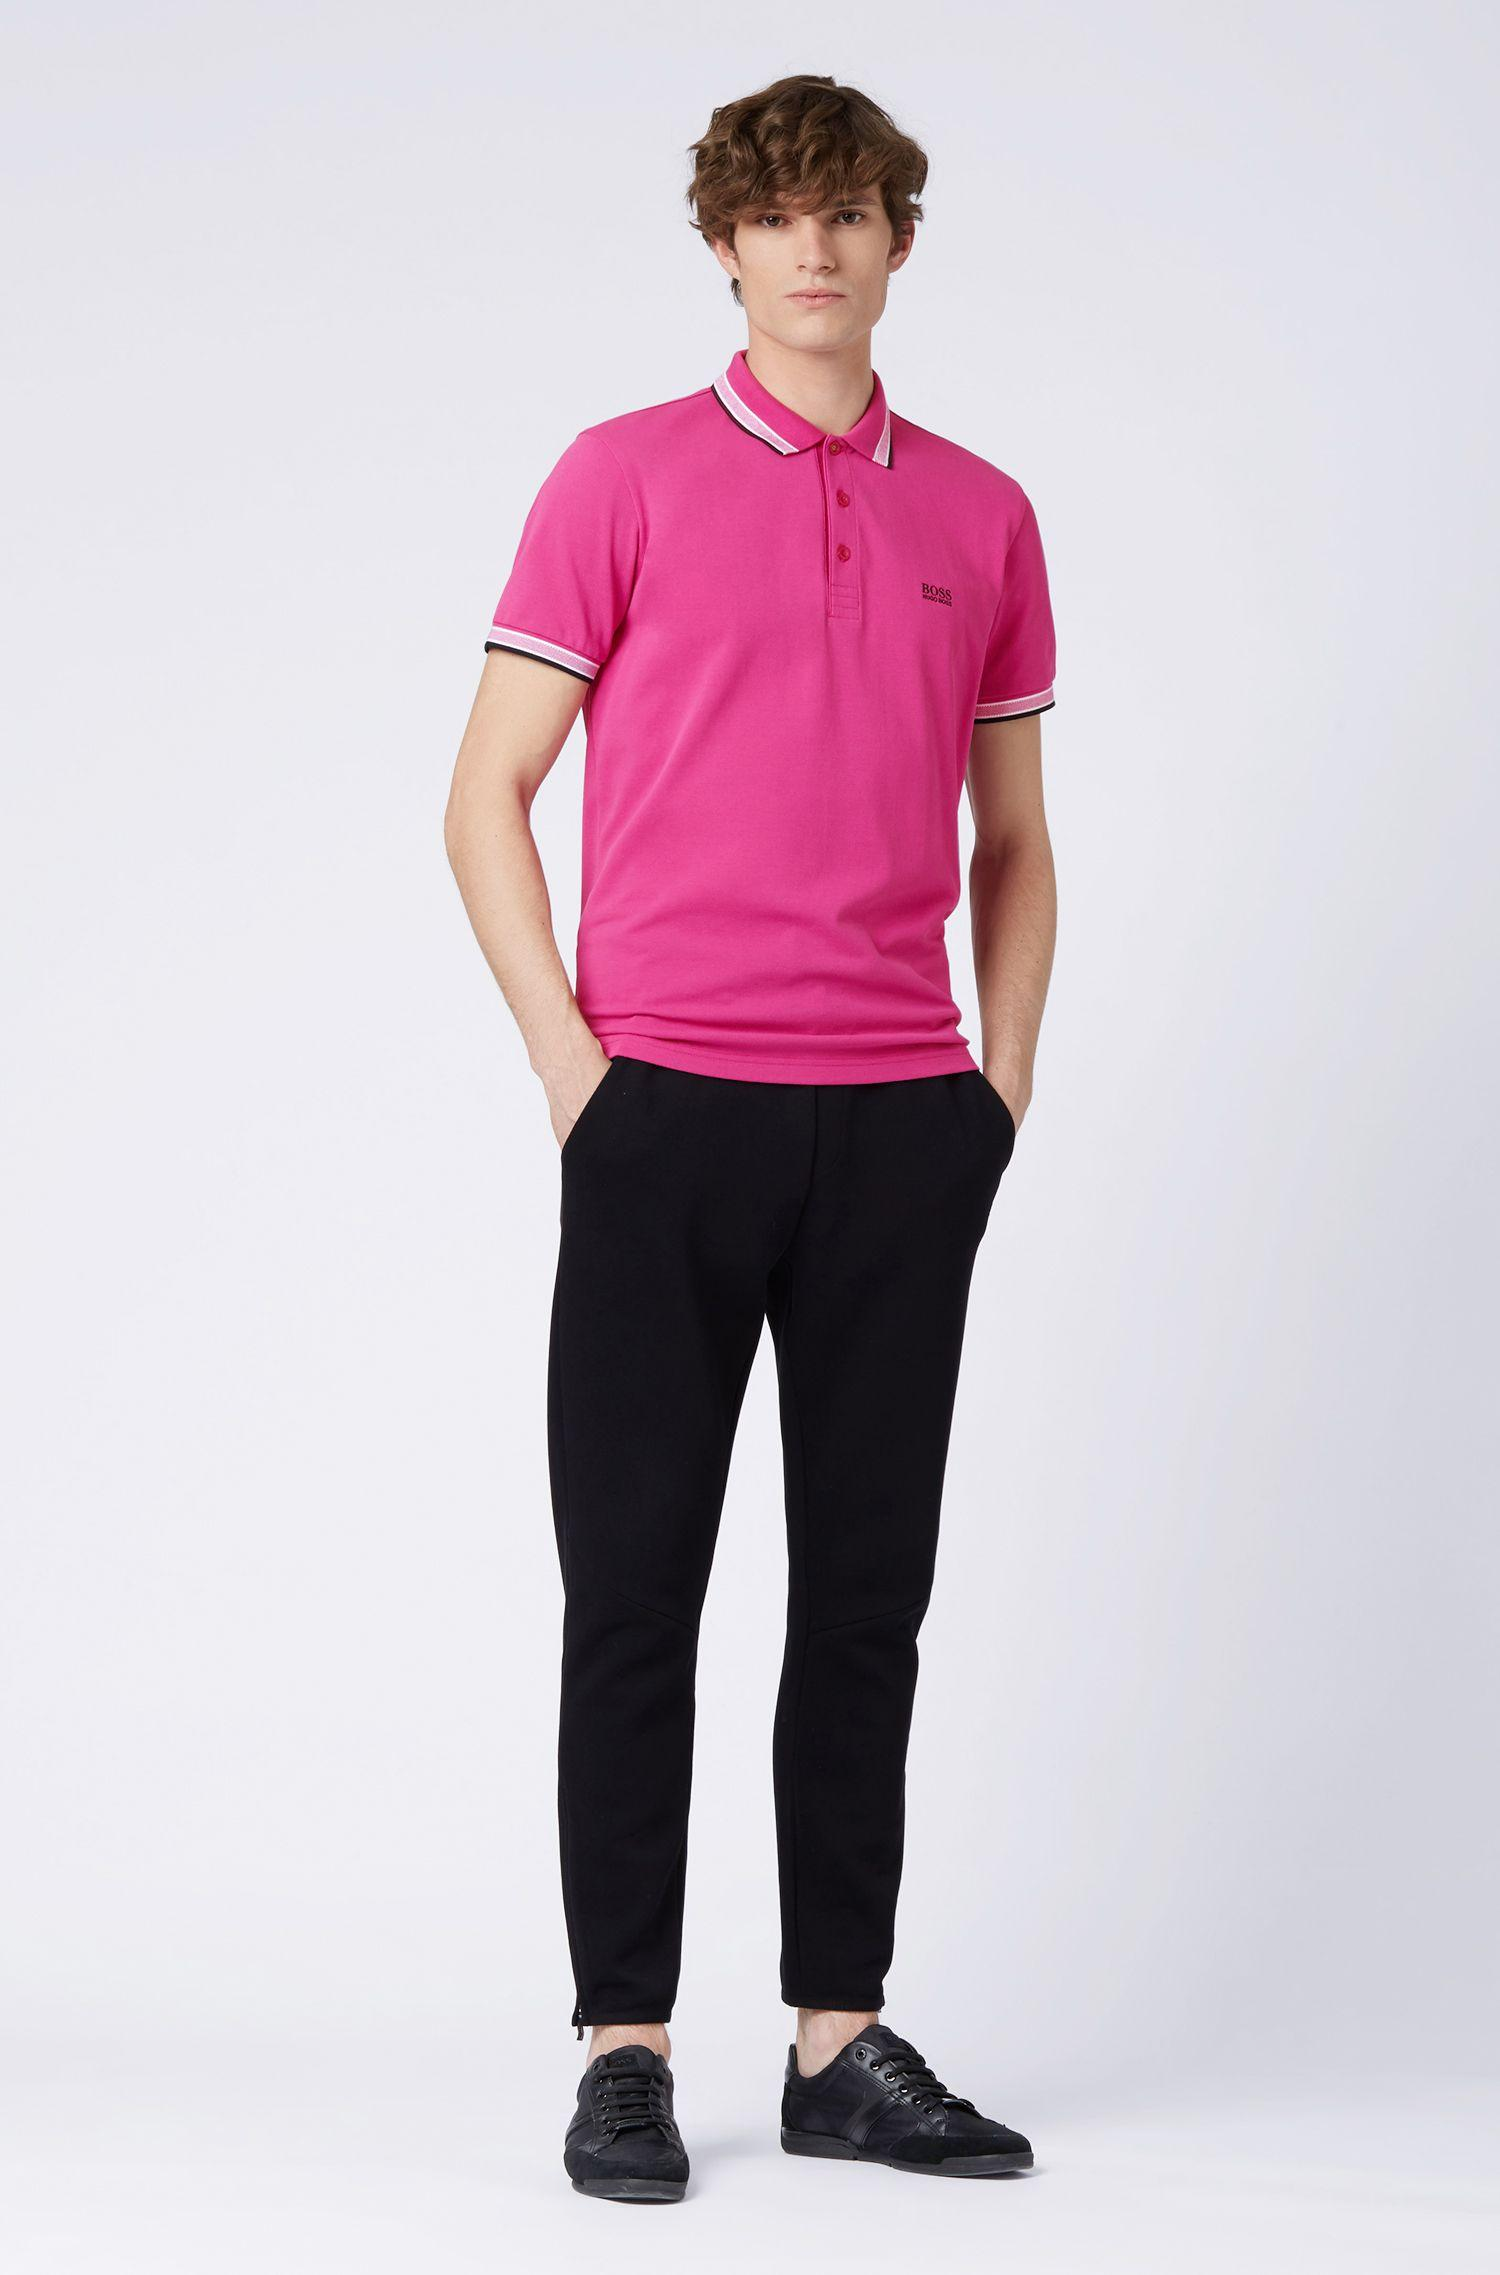 ccb913f6 BOSS - Pink Cotton-piqué Polo Shirt With Logo Undercollar for Men - Lyst.  View fullscreen